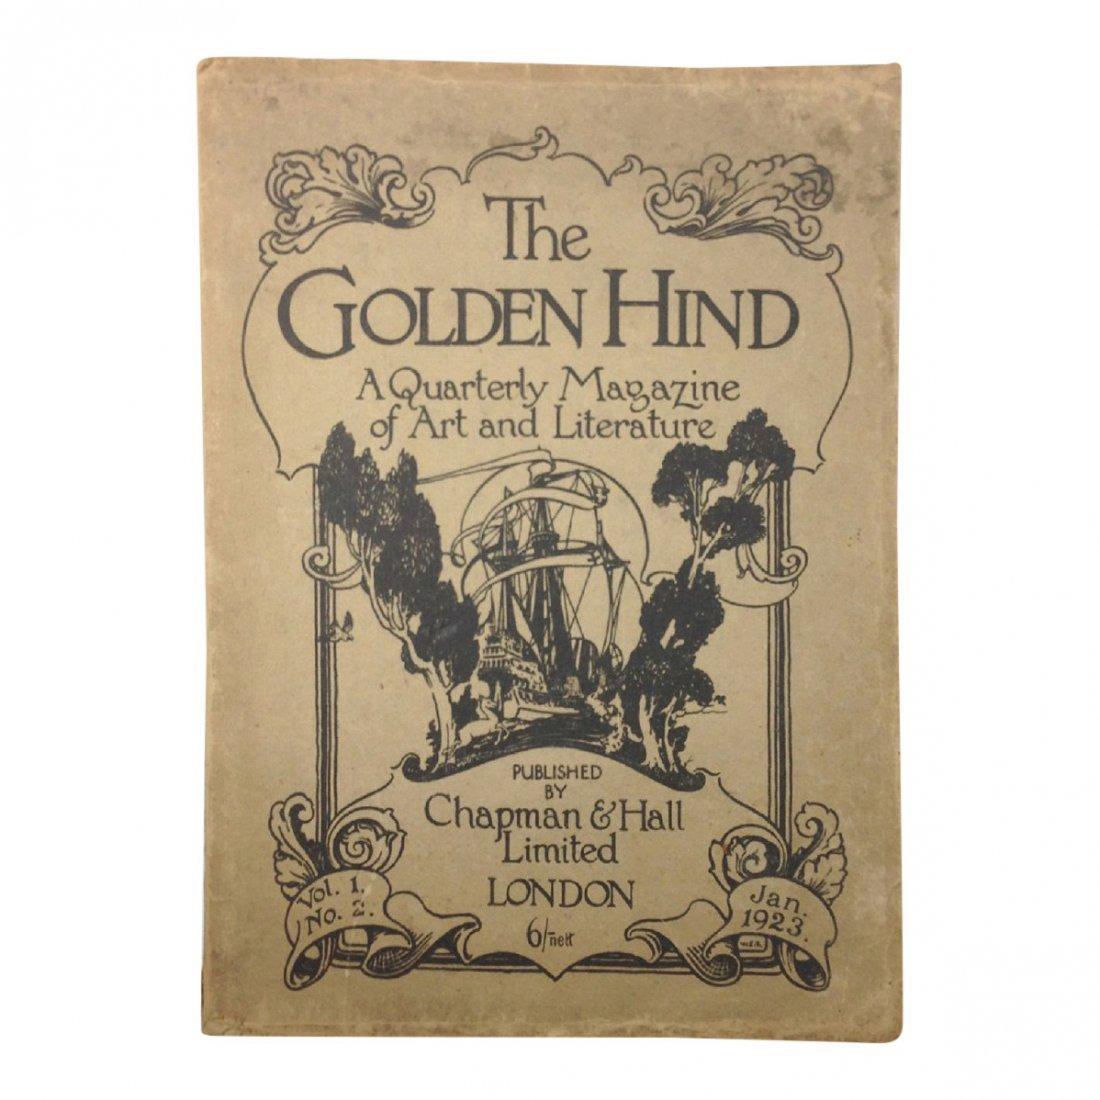 The Golden Hind Volume 1 No. 2